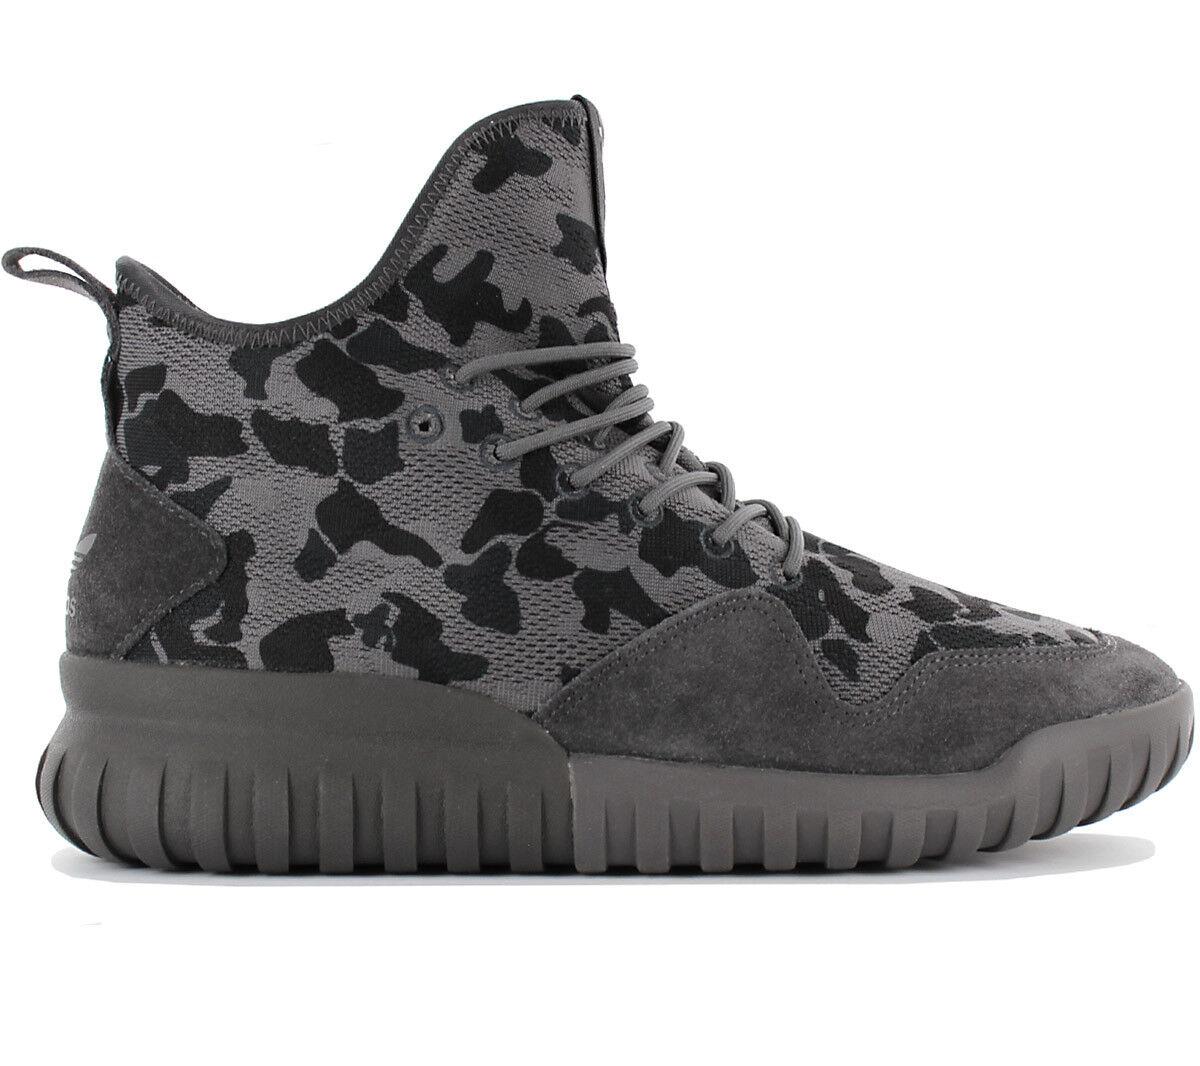 Adidas Originals Uncgd Tubular X Uncgd Originals Uncaged Chaussures Baskets Gris Camouflage 4ee644